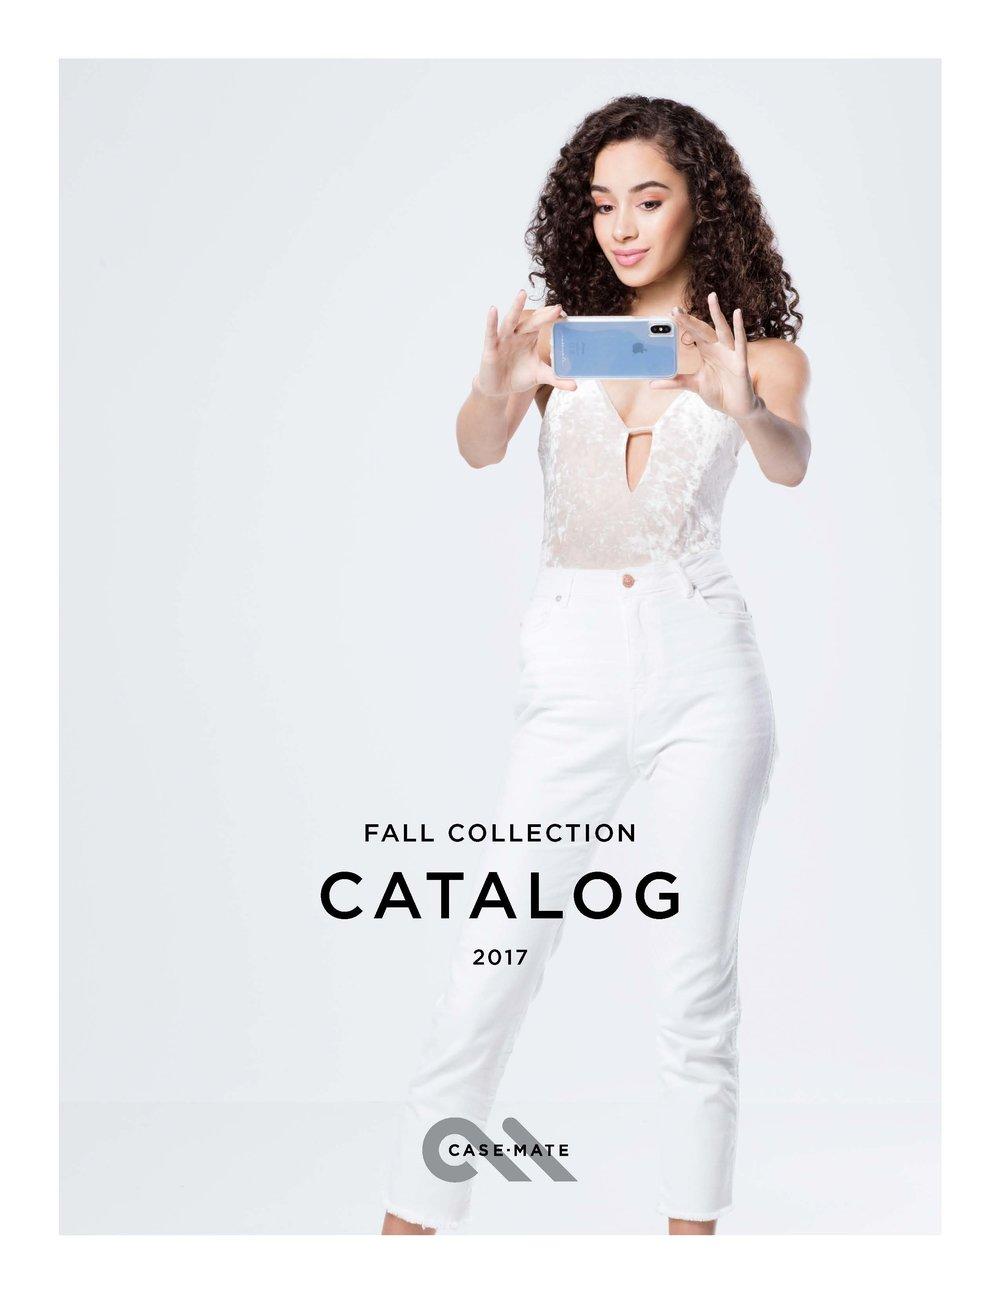 CM_Amazon Catalog_090117_Page_01.jpg